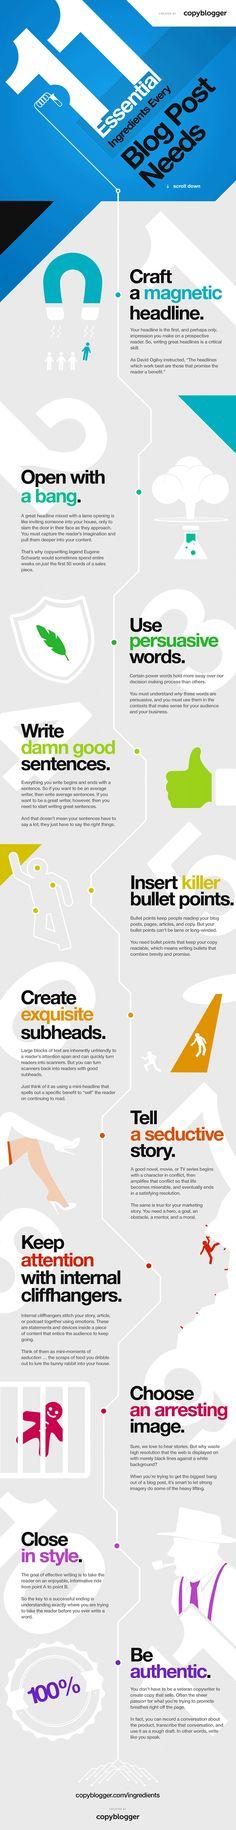 Essential #Blog Post Ingredients #Infographic